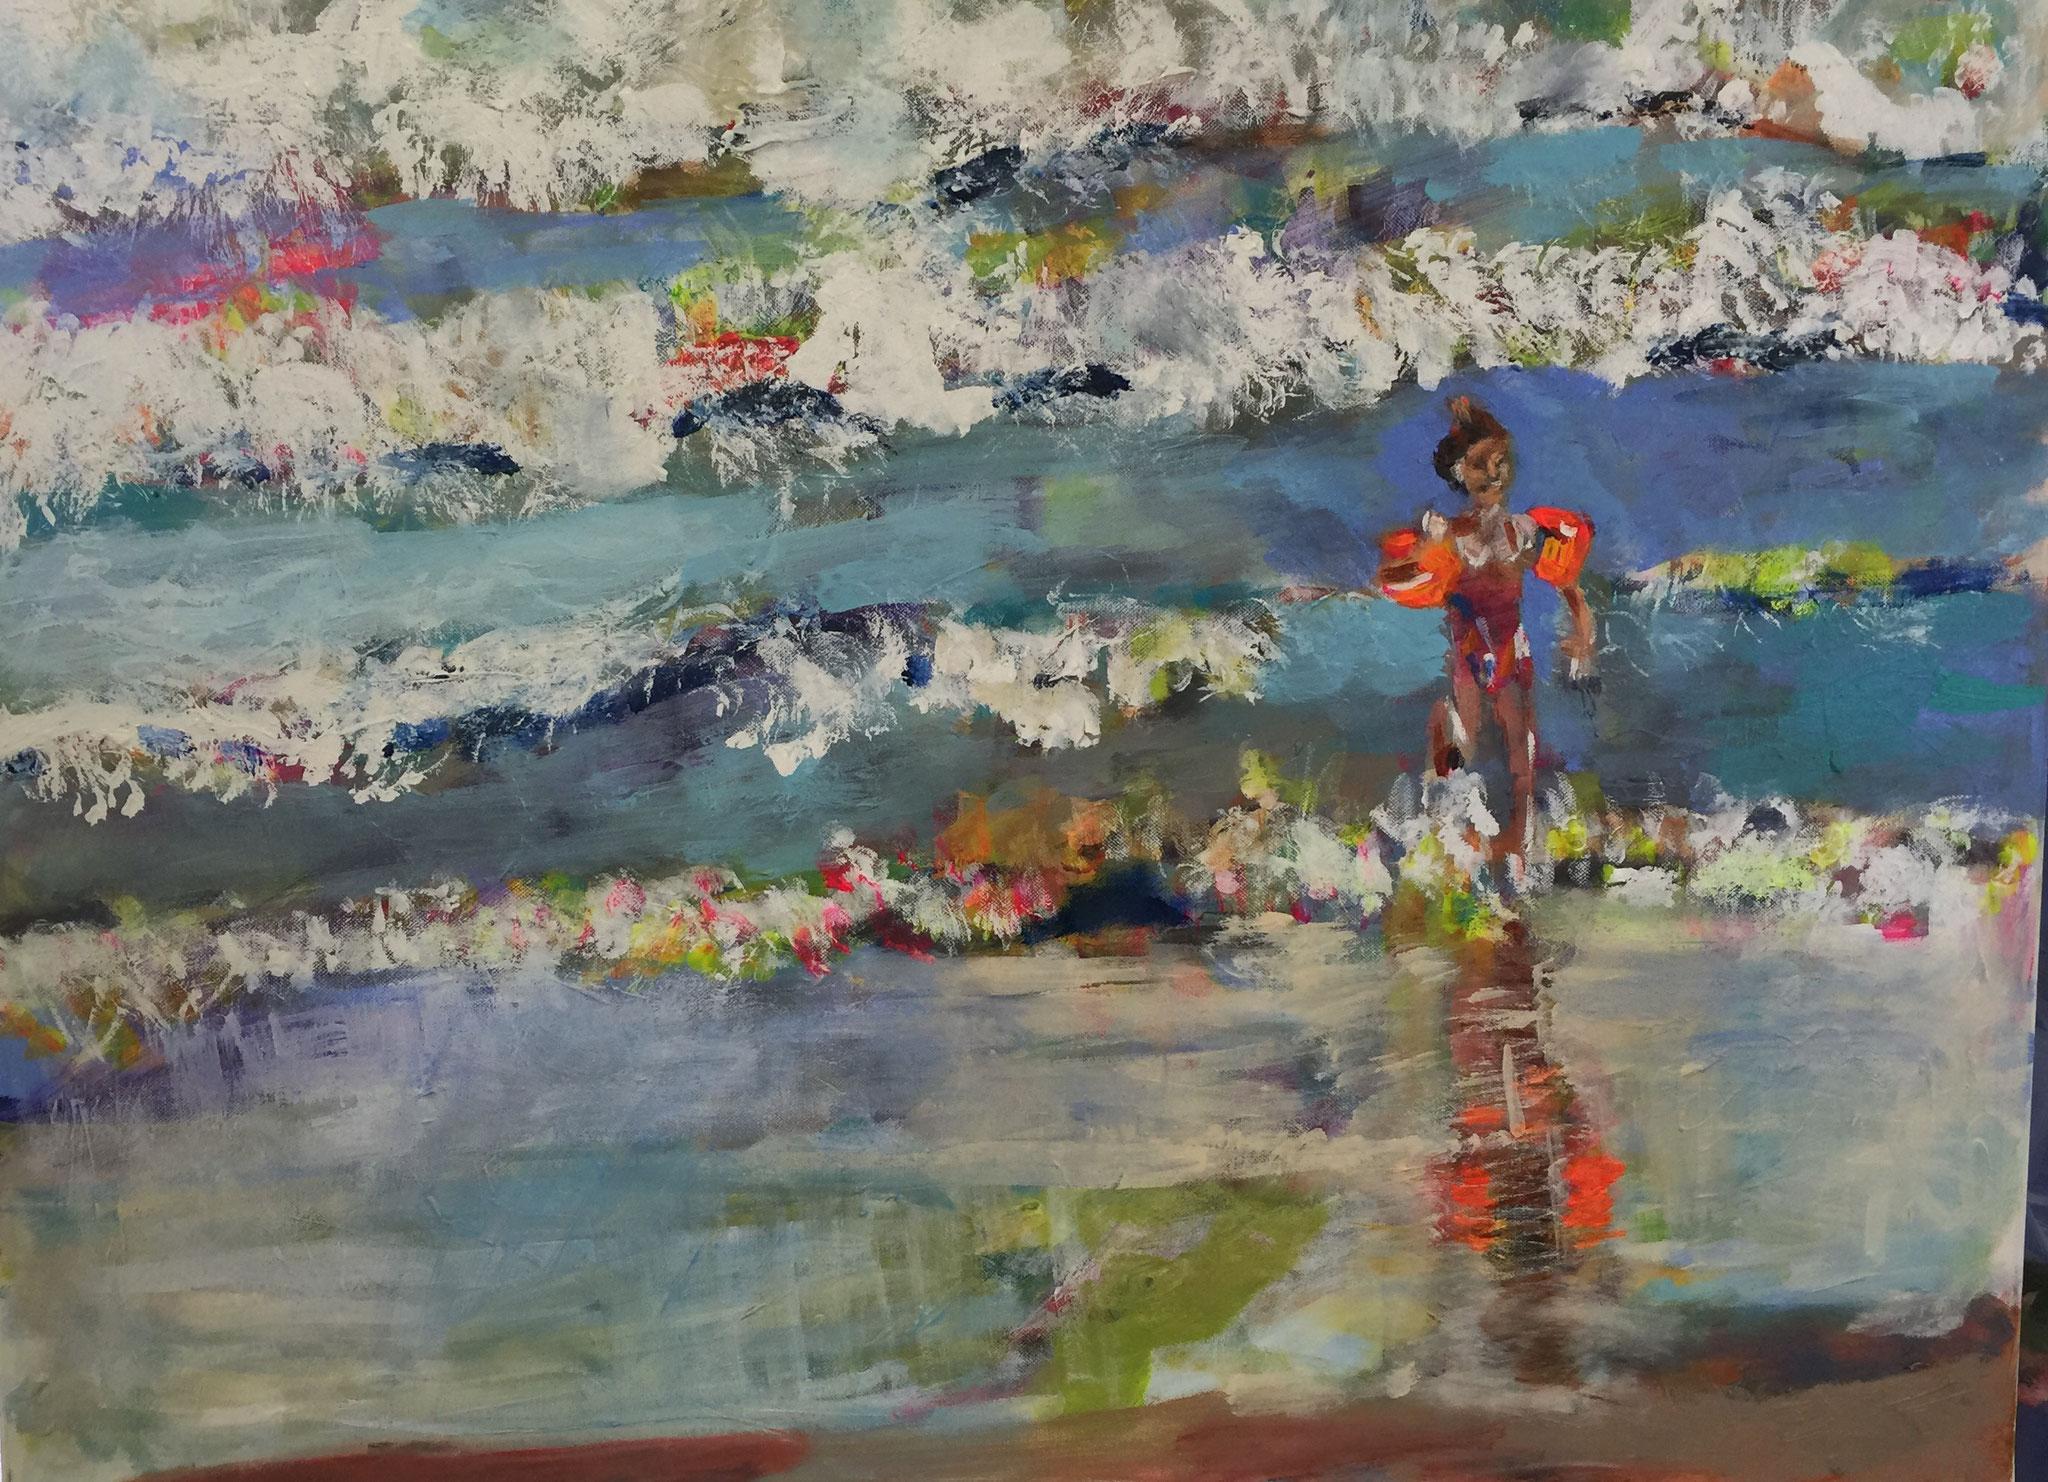 Wasser 2, 60x80  acrylic on canvas